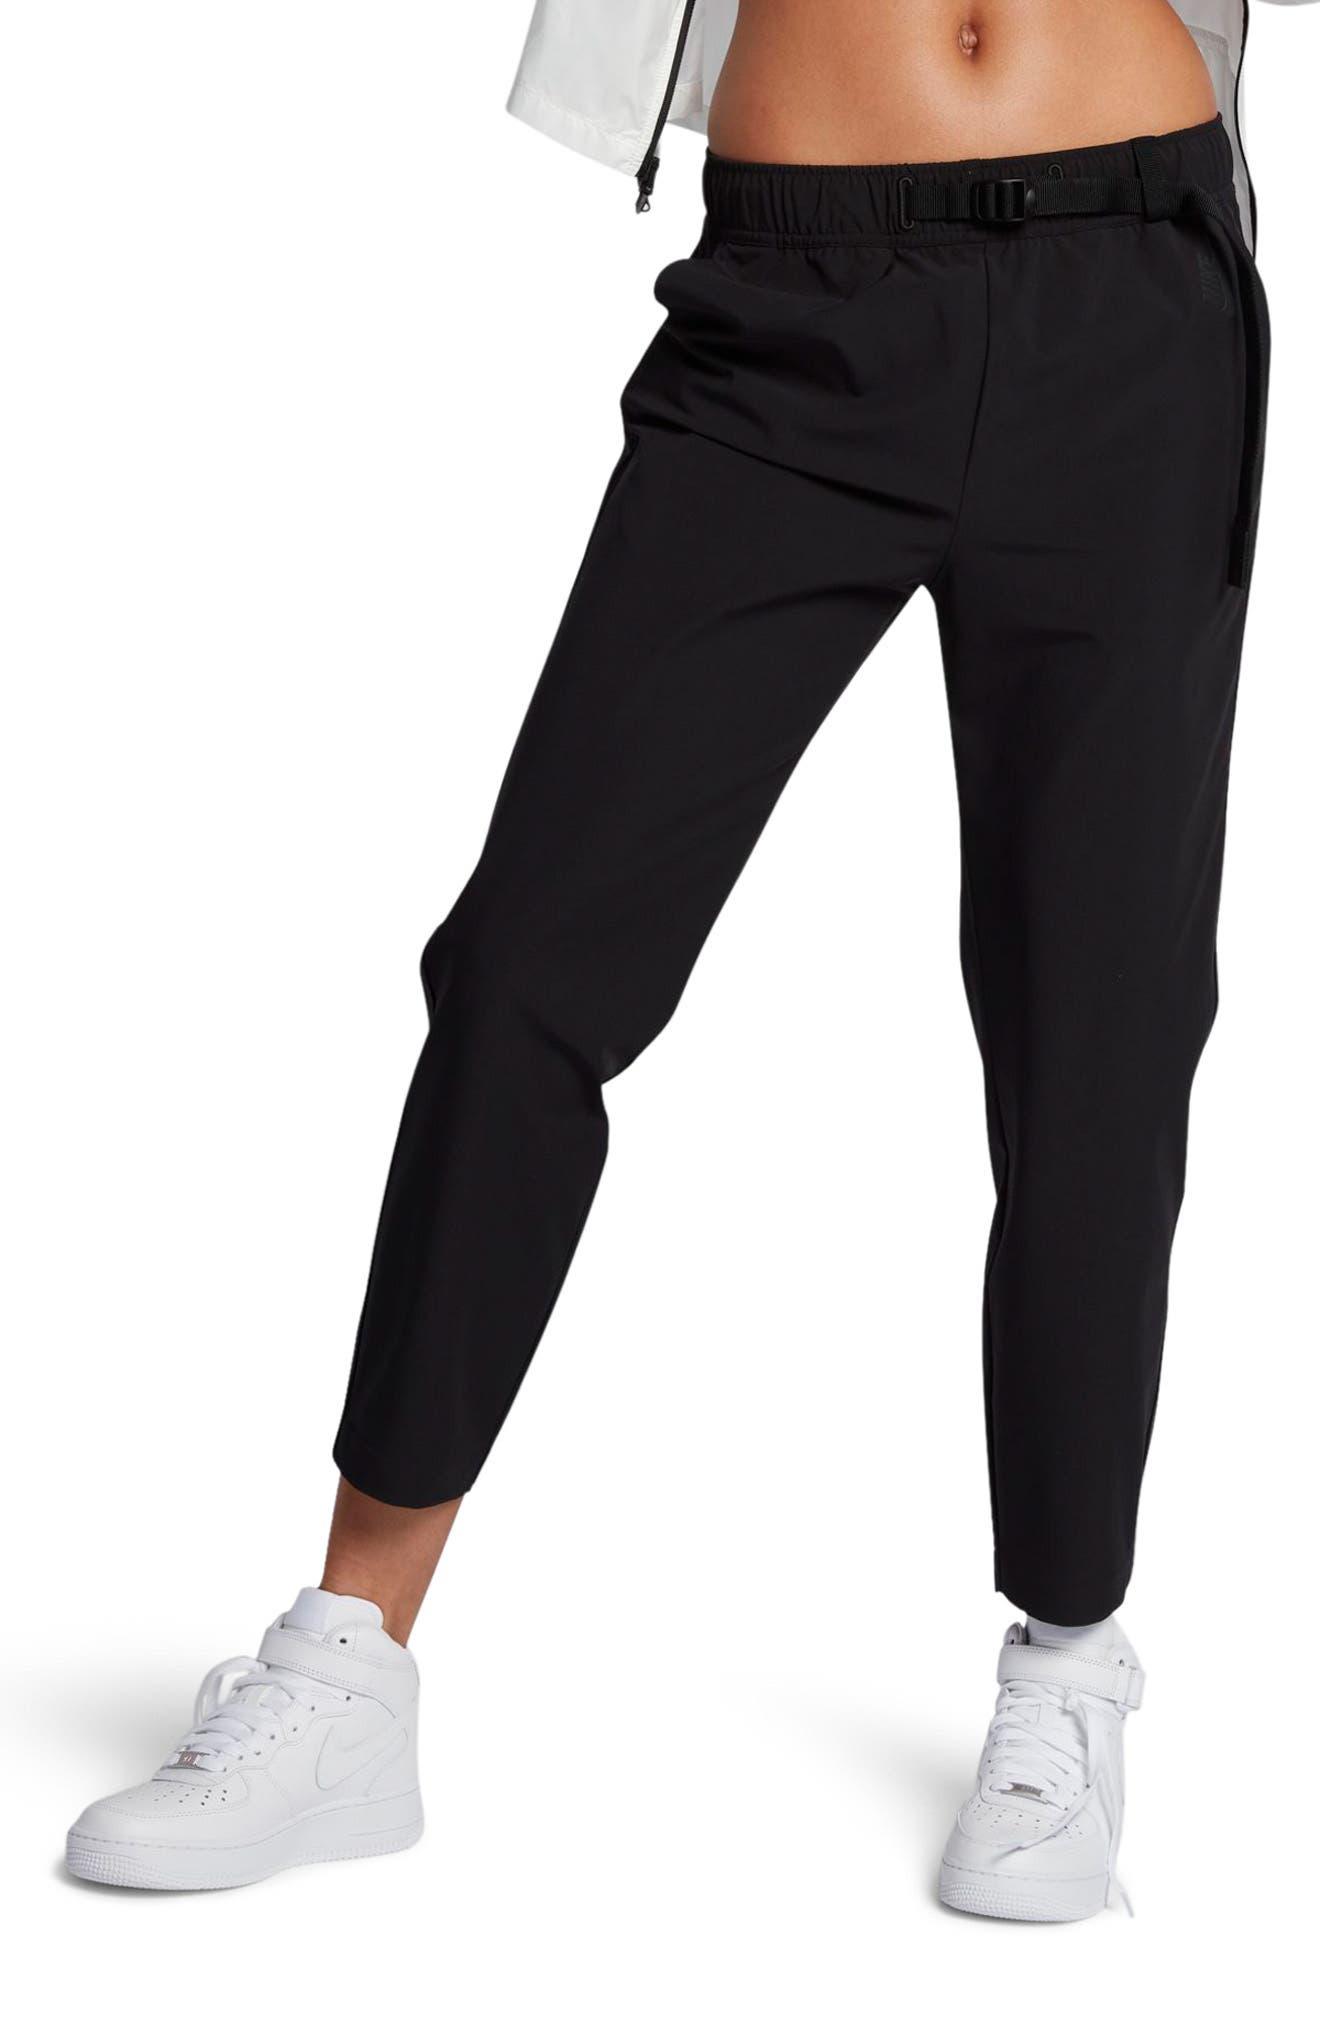 NikeLab Essentials Women's Stretch Woven Pants,                         Main,                         color, Black/ Black